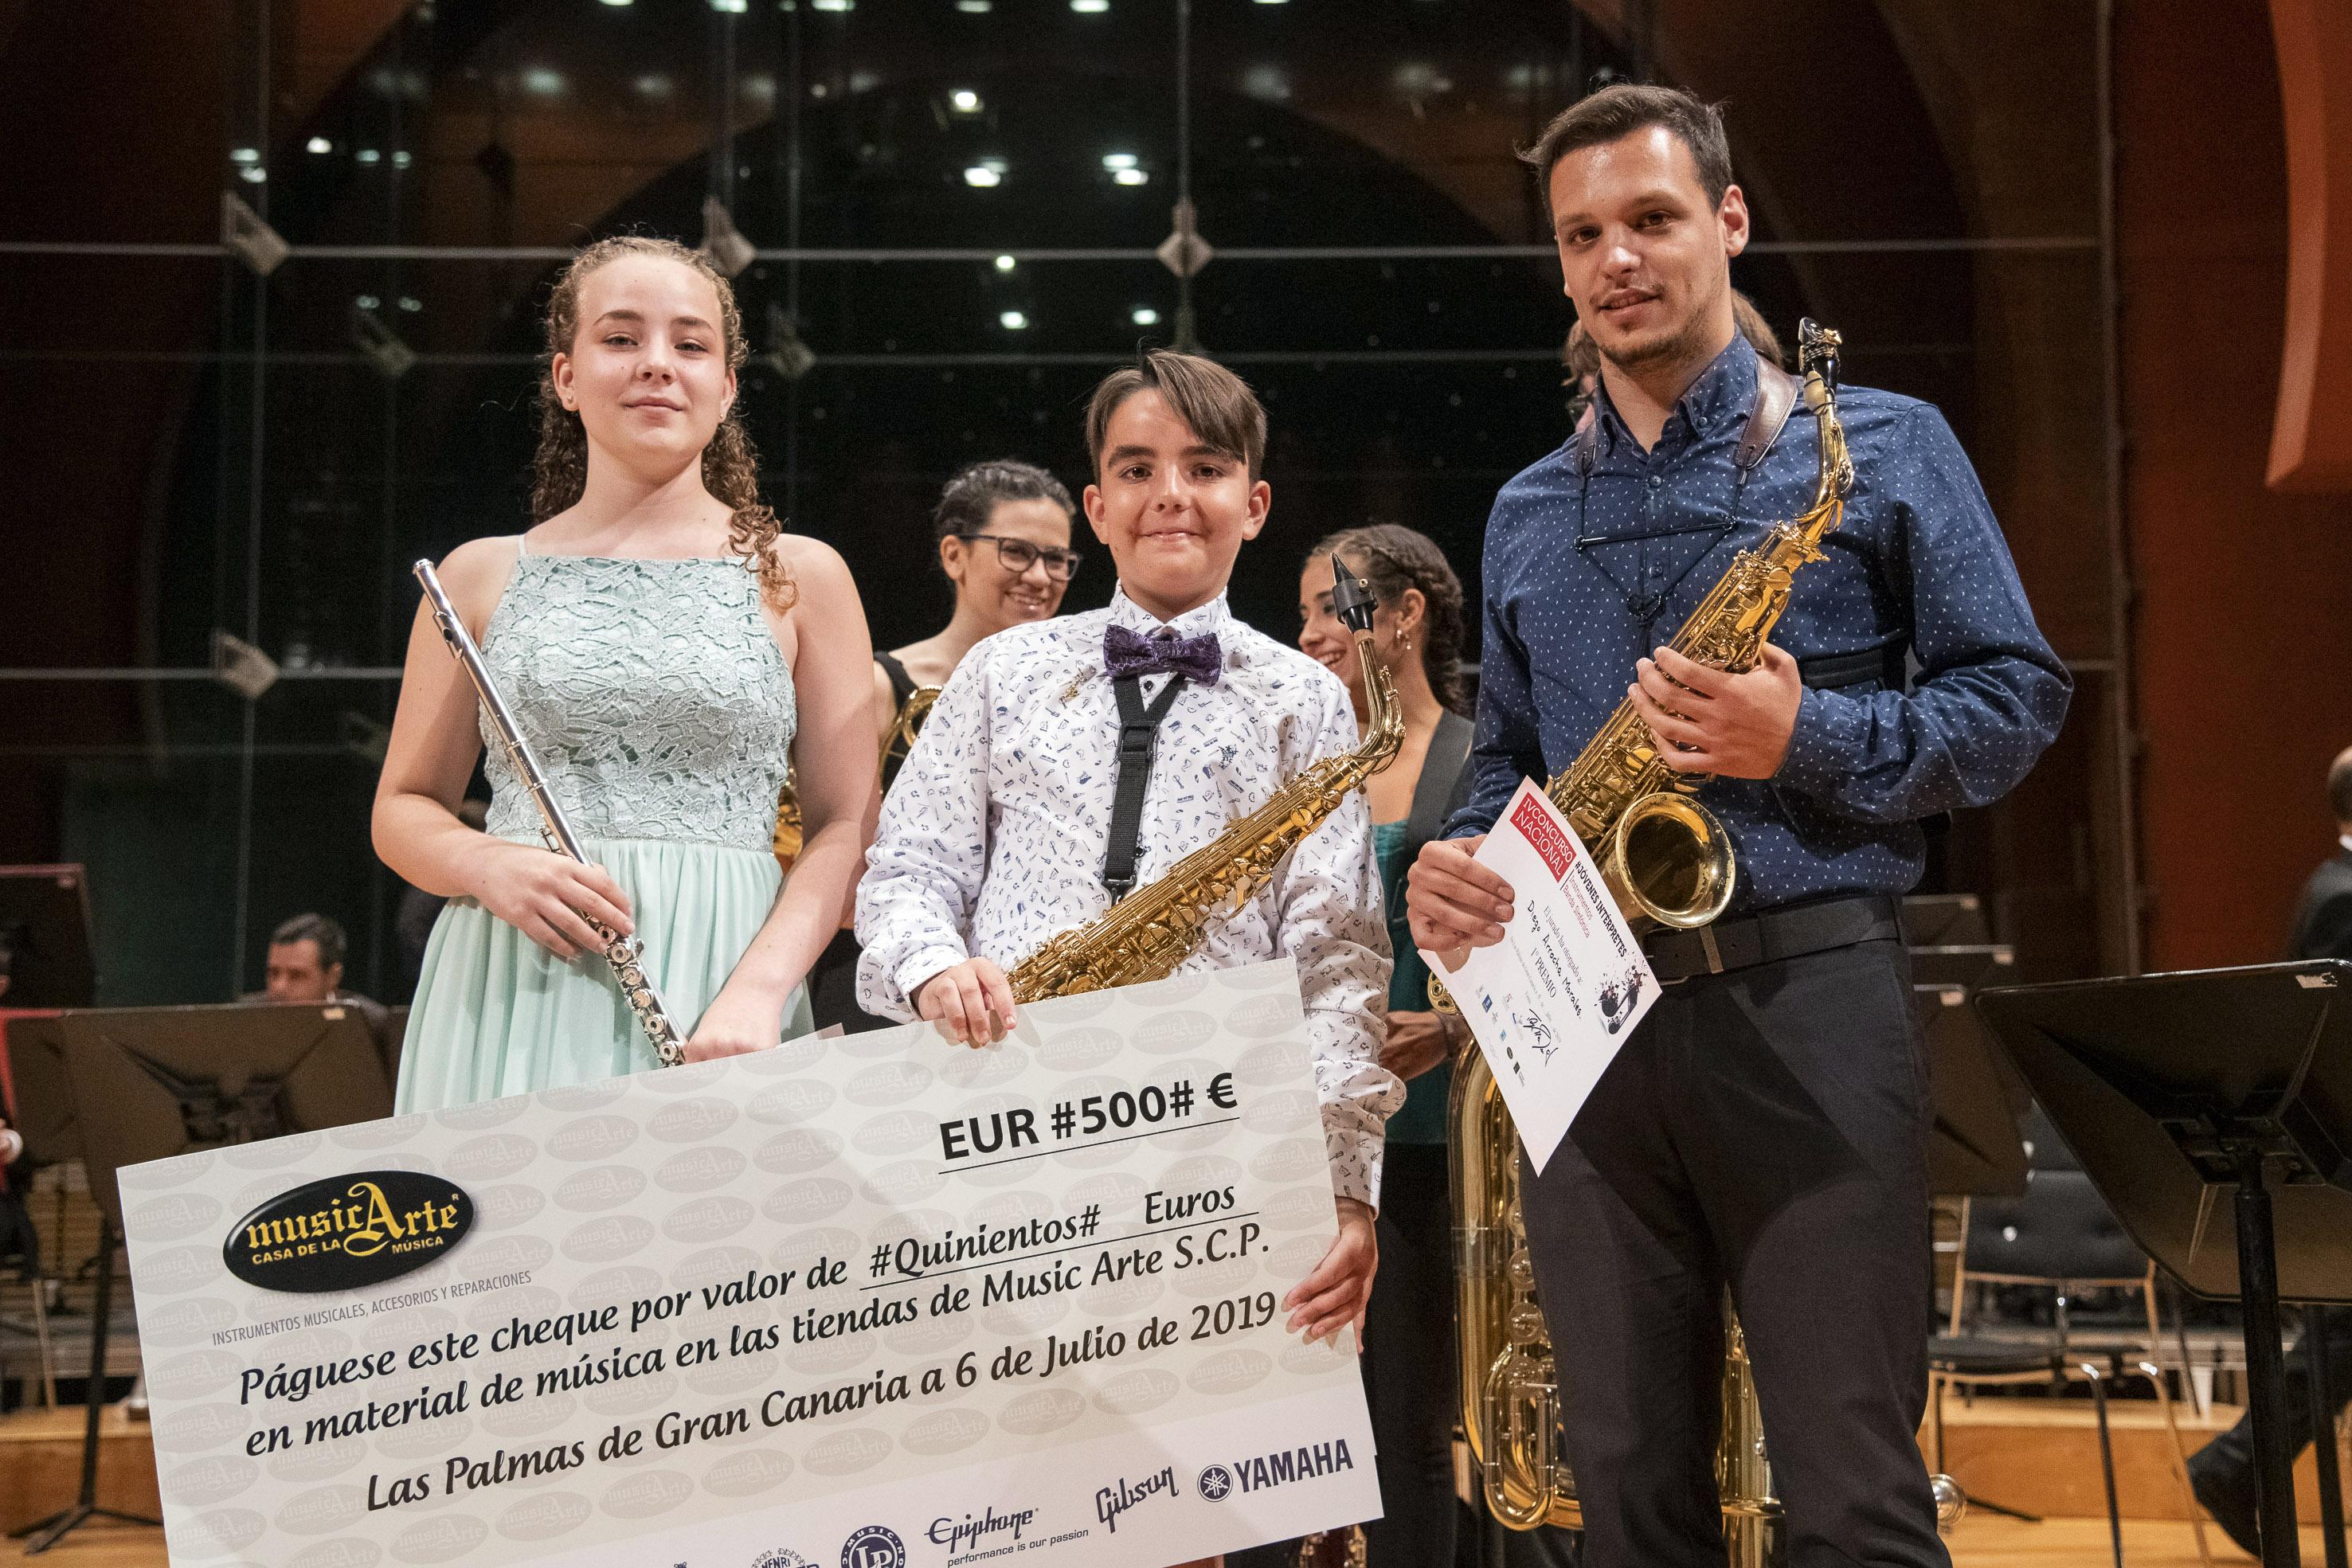 El saxofonista Diego Arrocha gana el IV Concurso Nacional de Jóvenes Intérpretes de la capital grancanaria